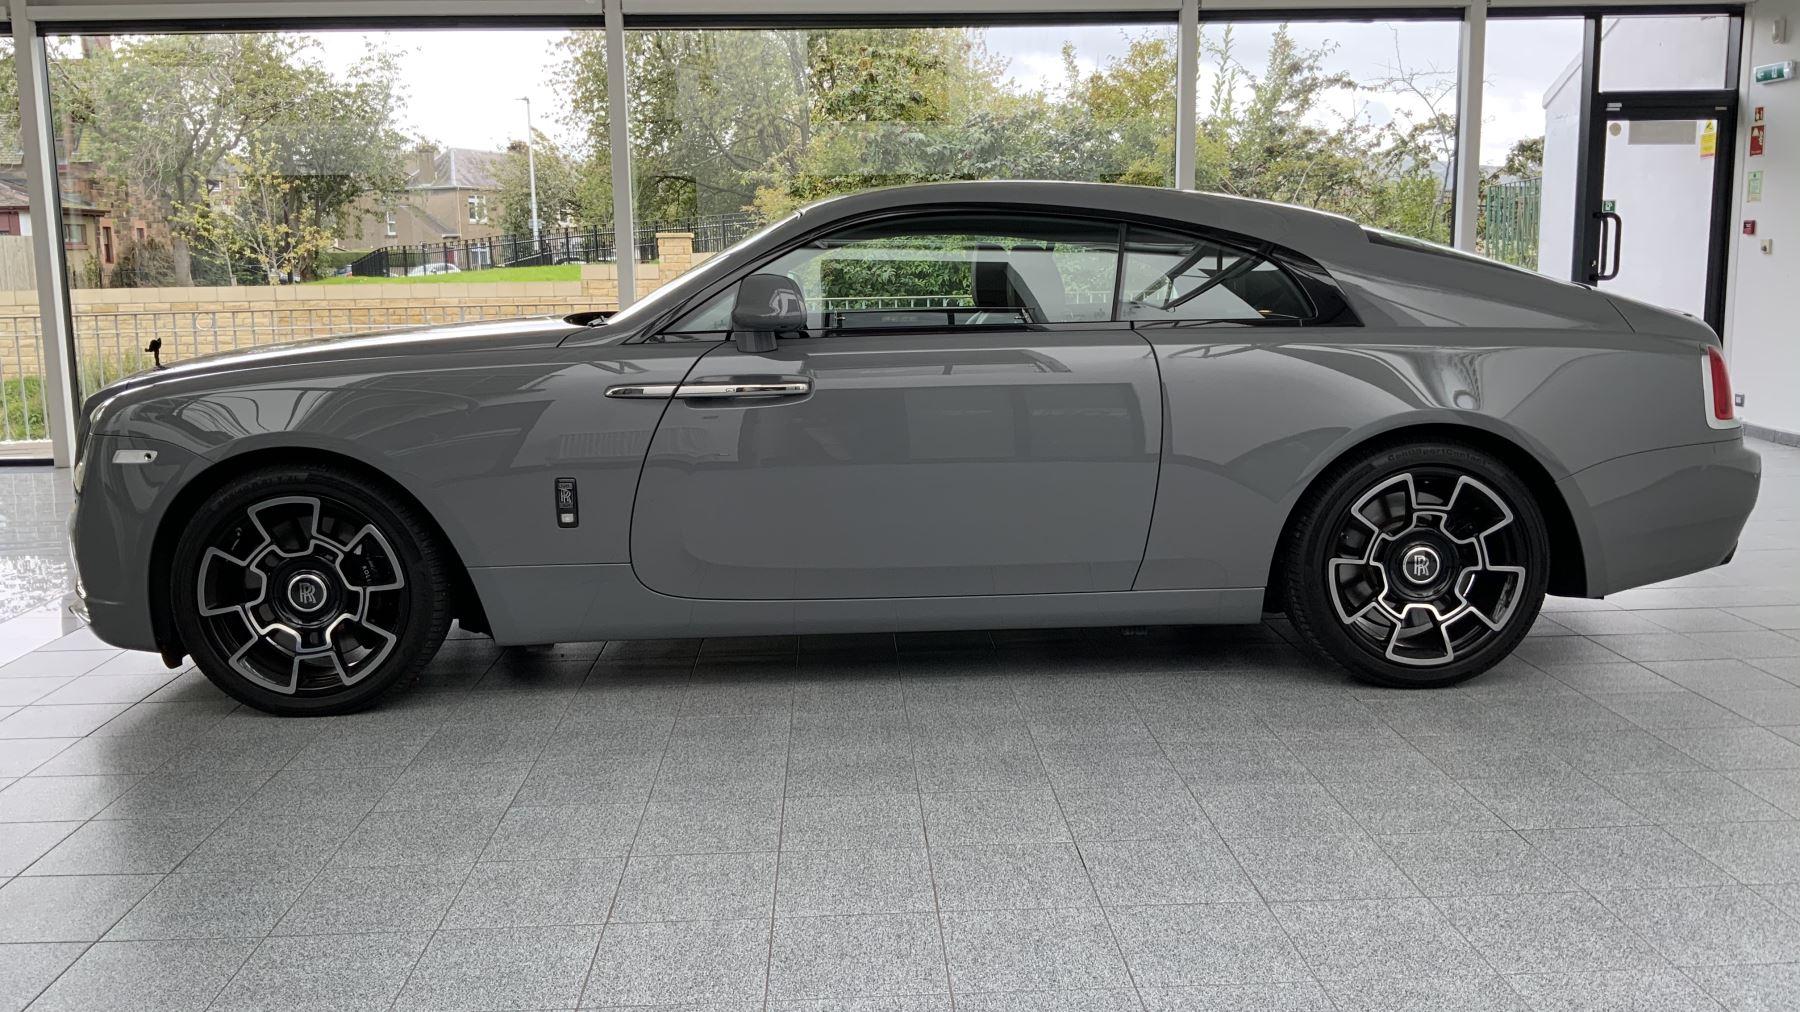 Rolls-Royce Black Badge Wraith V12 image 2